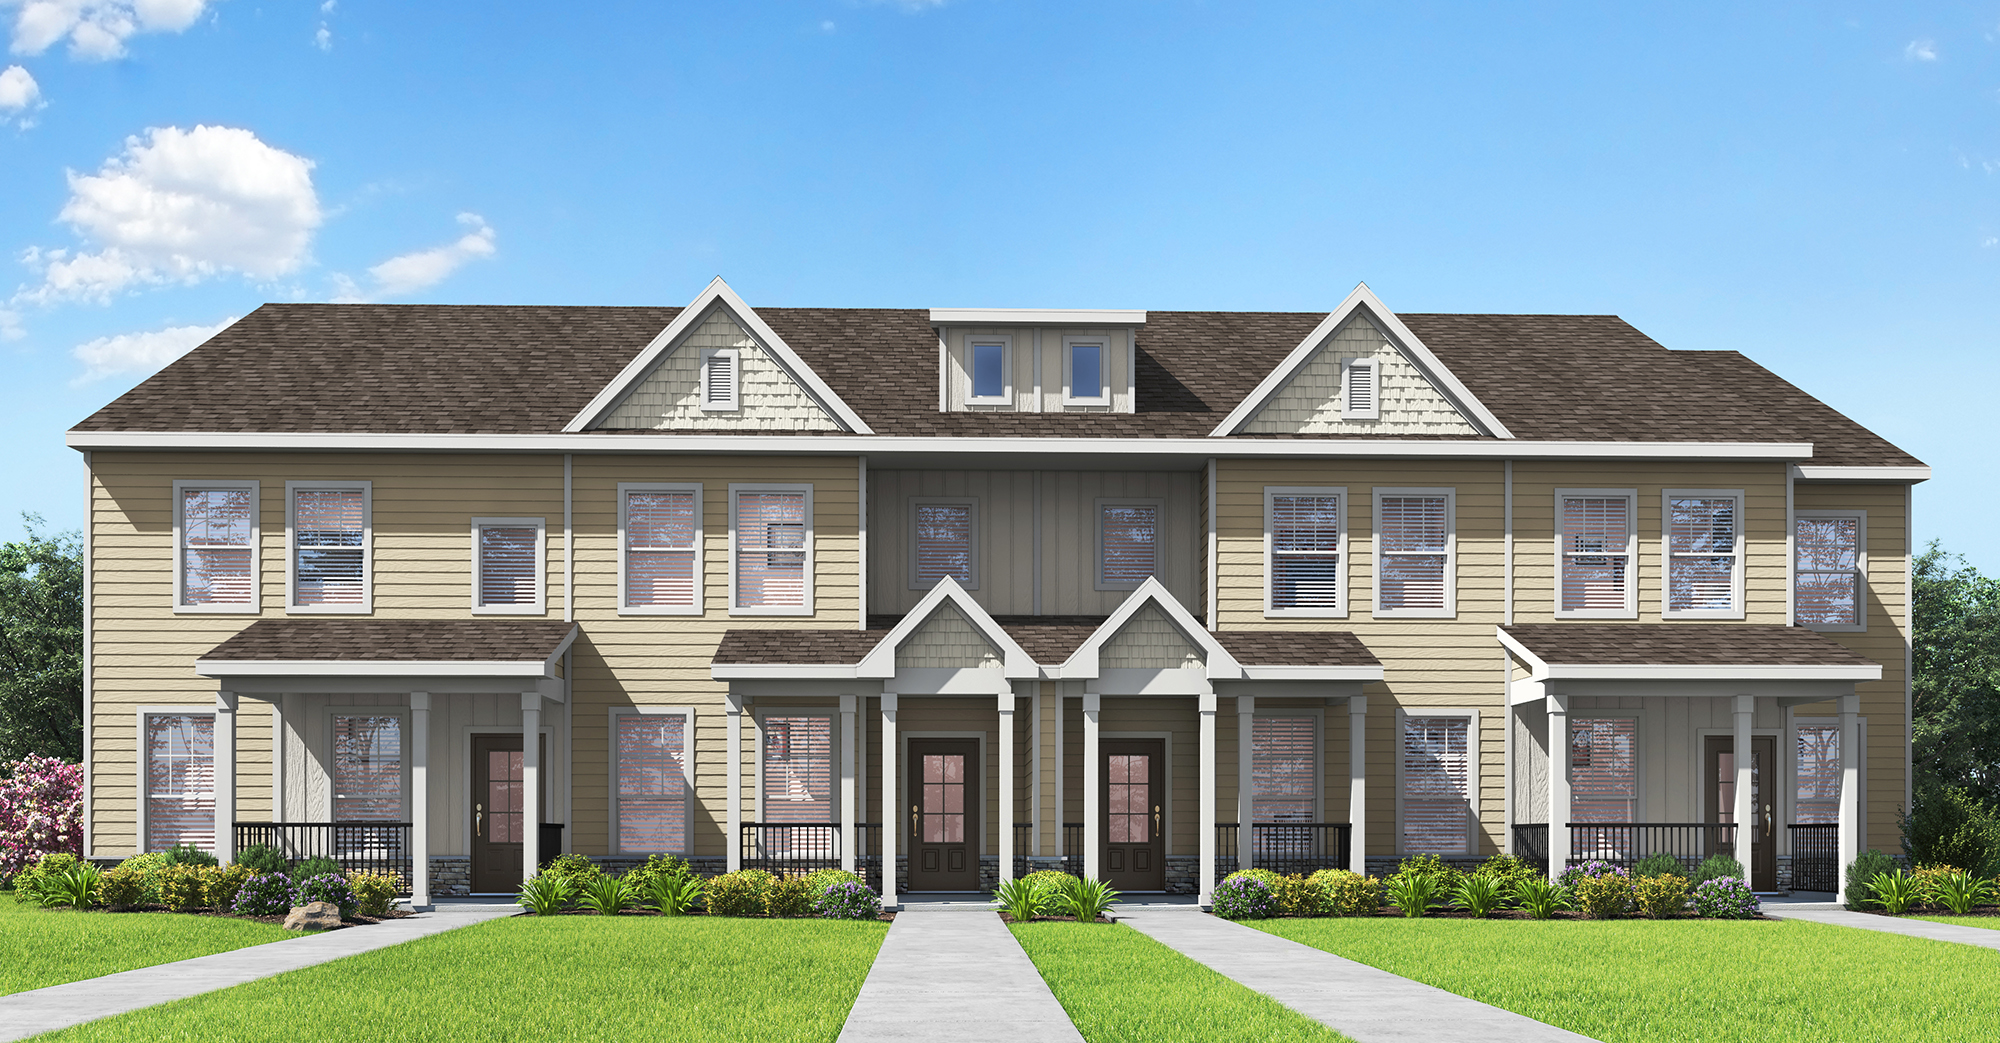 Townhomes by LGI Homes at Huntington Pointe